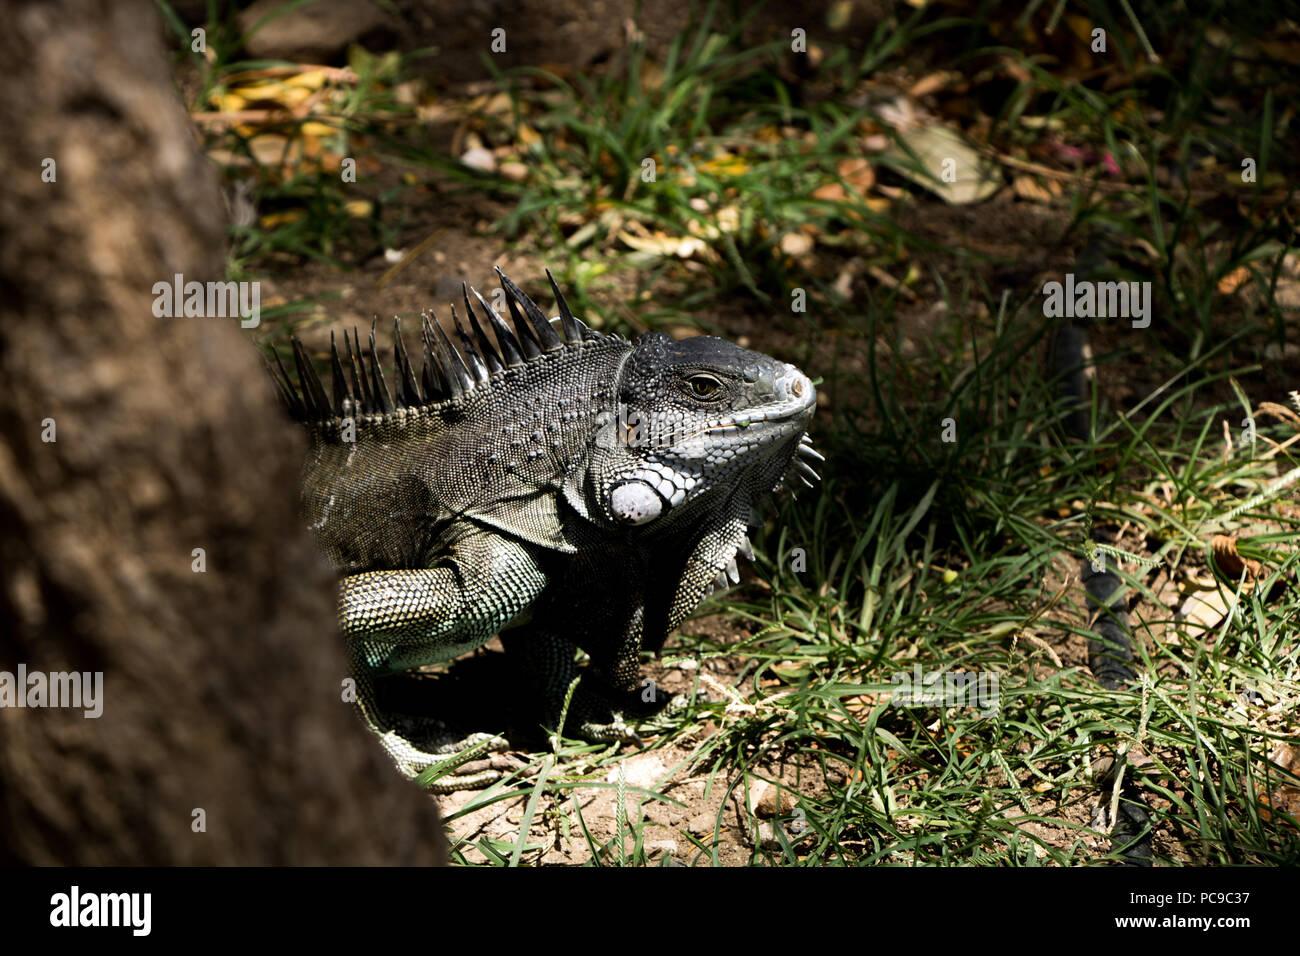 brown iguana lizard standing